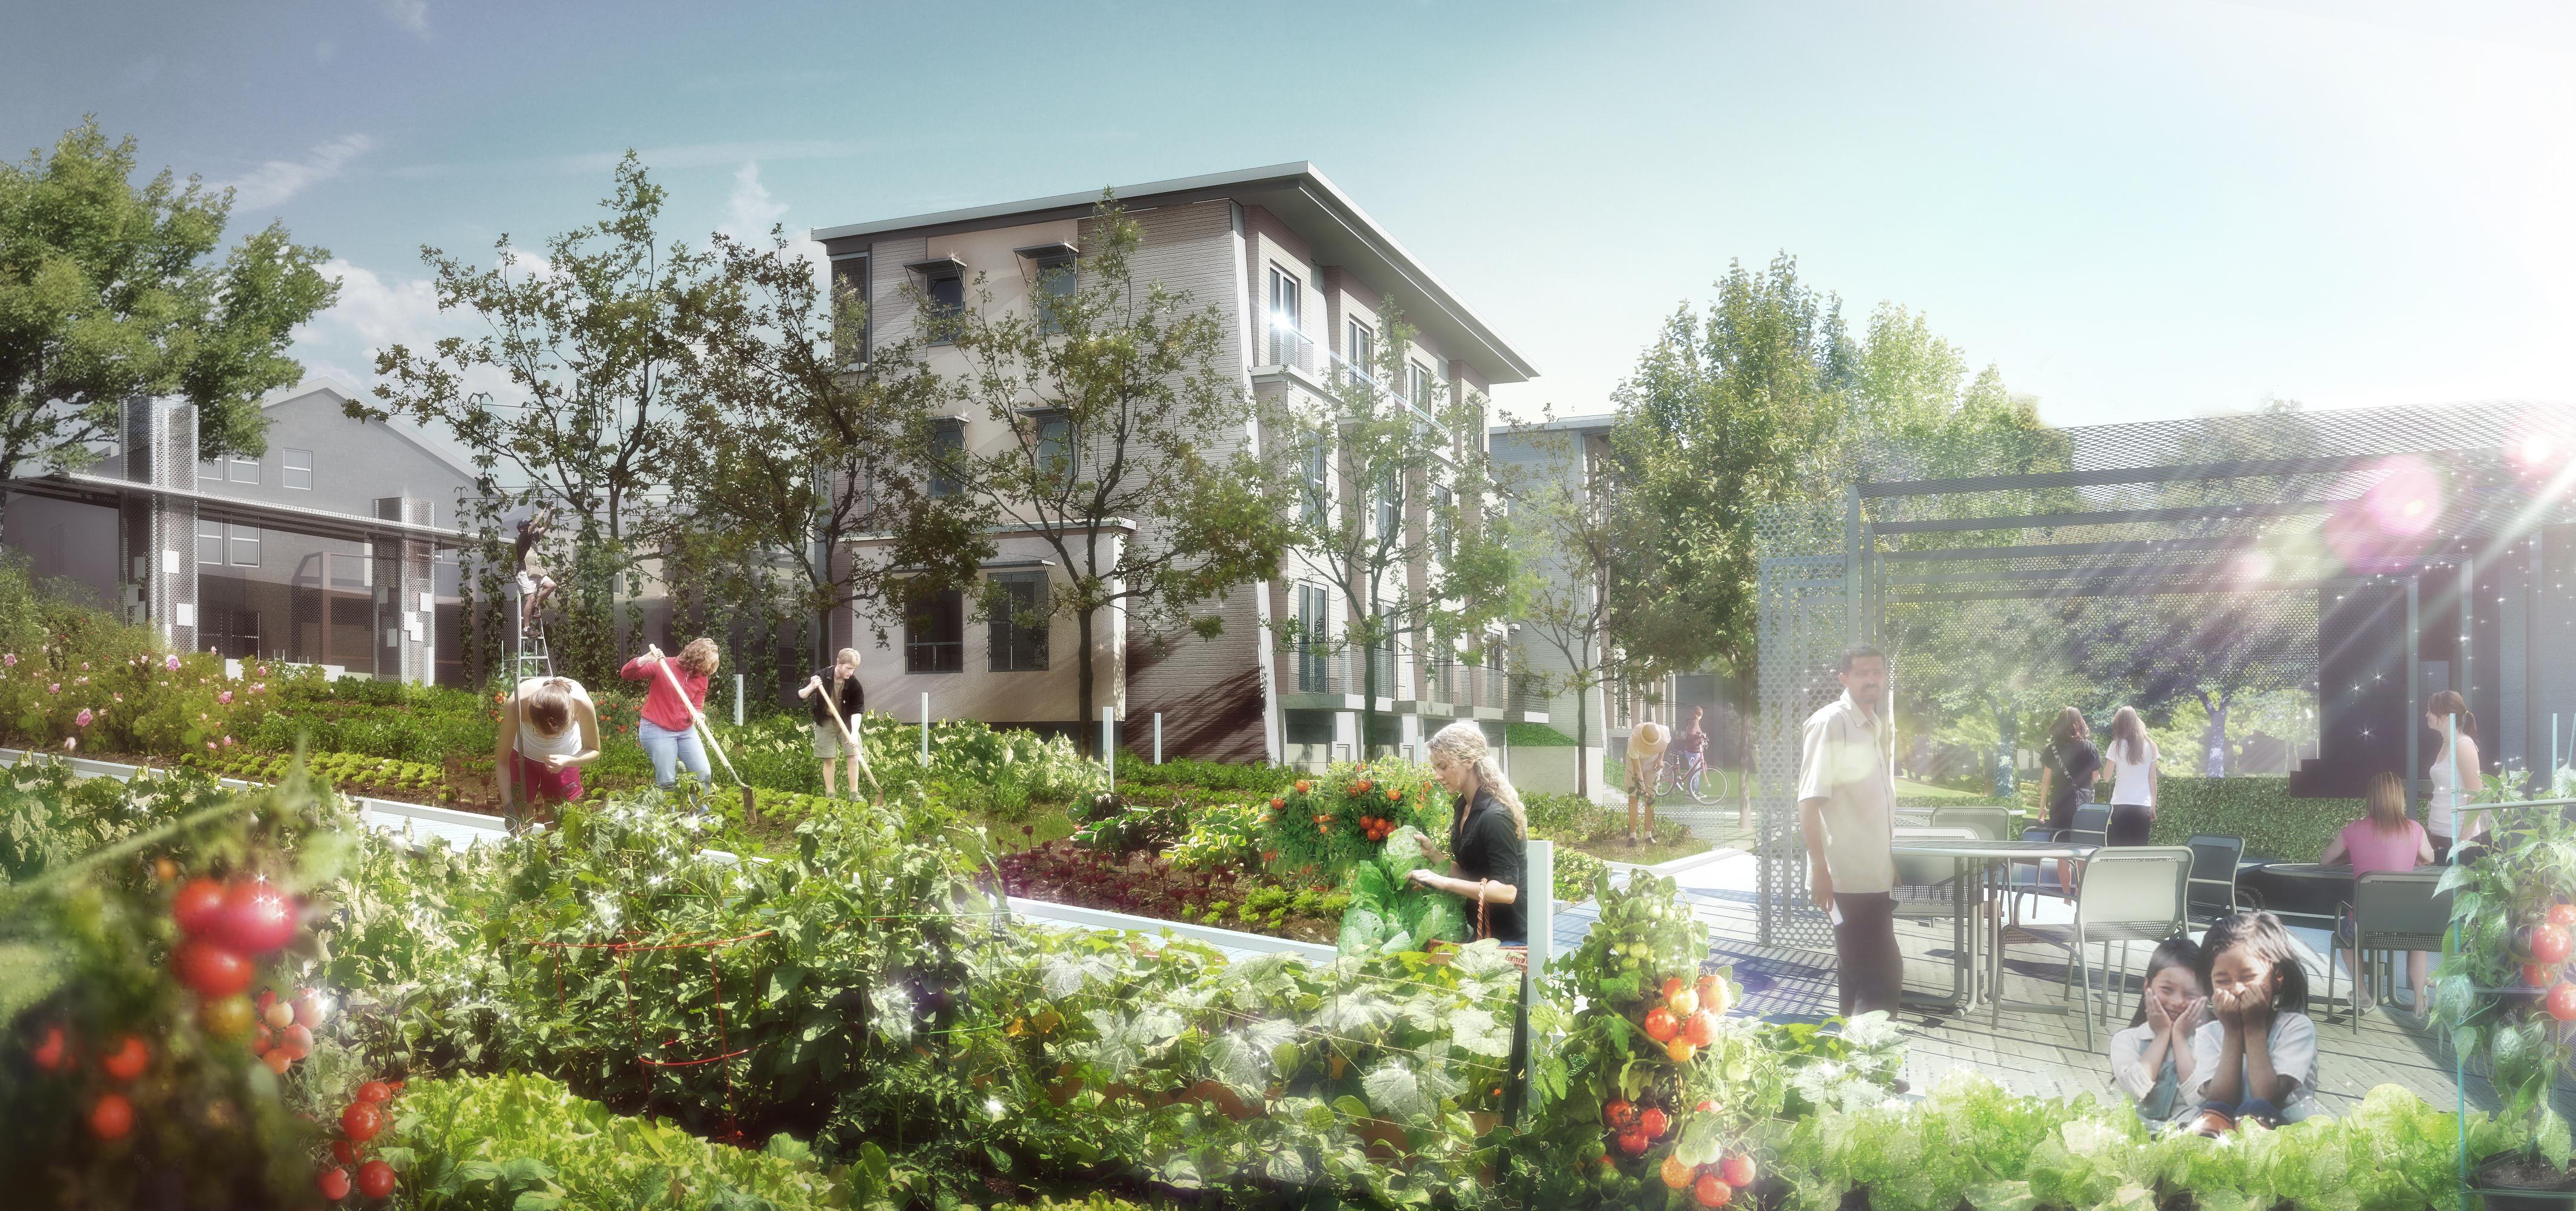 Energy Positive Housing (E+) in Boston | Studio G Architects on community work space, community park space, home space, garage space, art gallery space, living room space, community pool, community diy space, cricut design space,